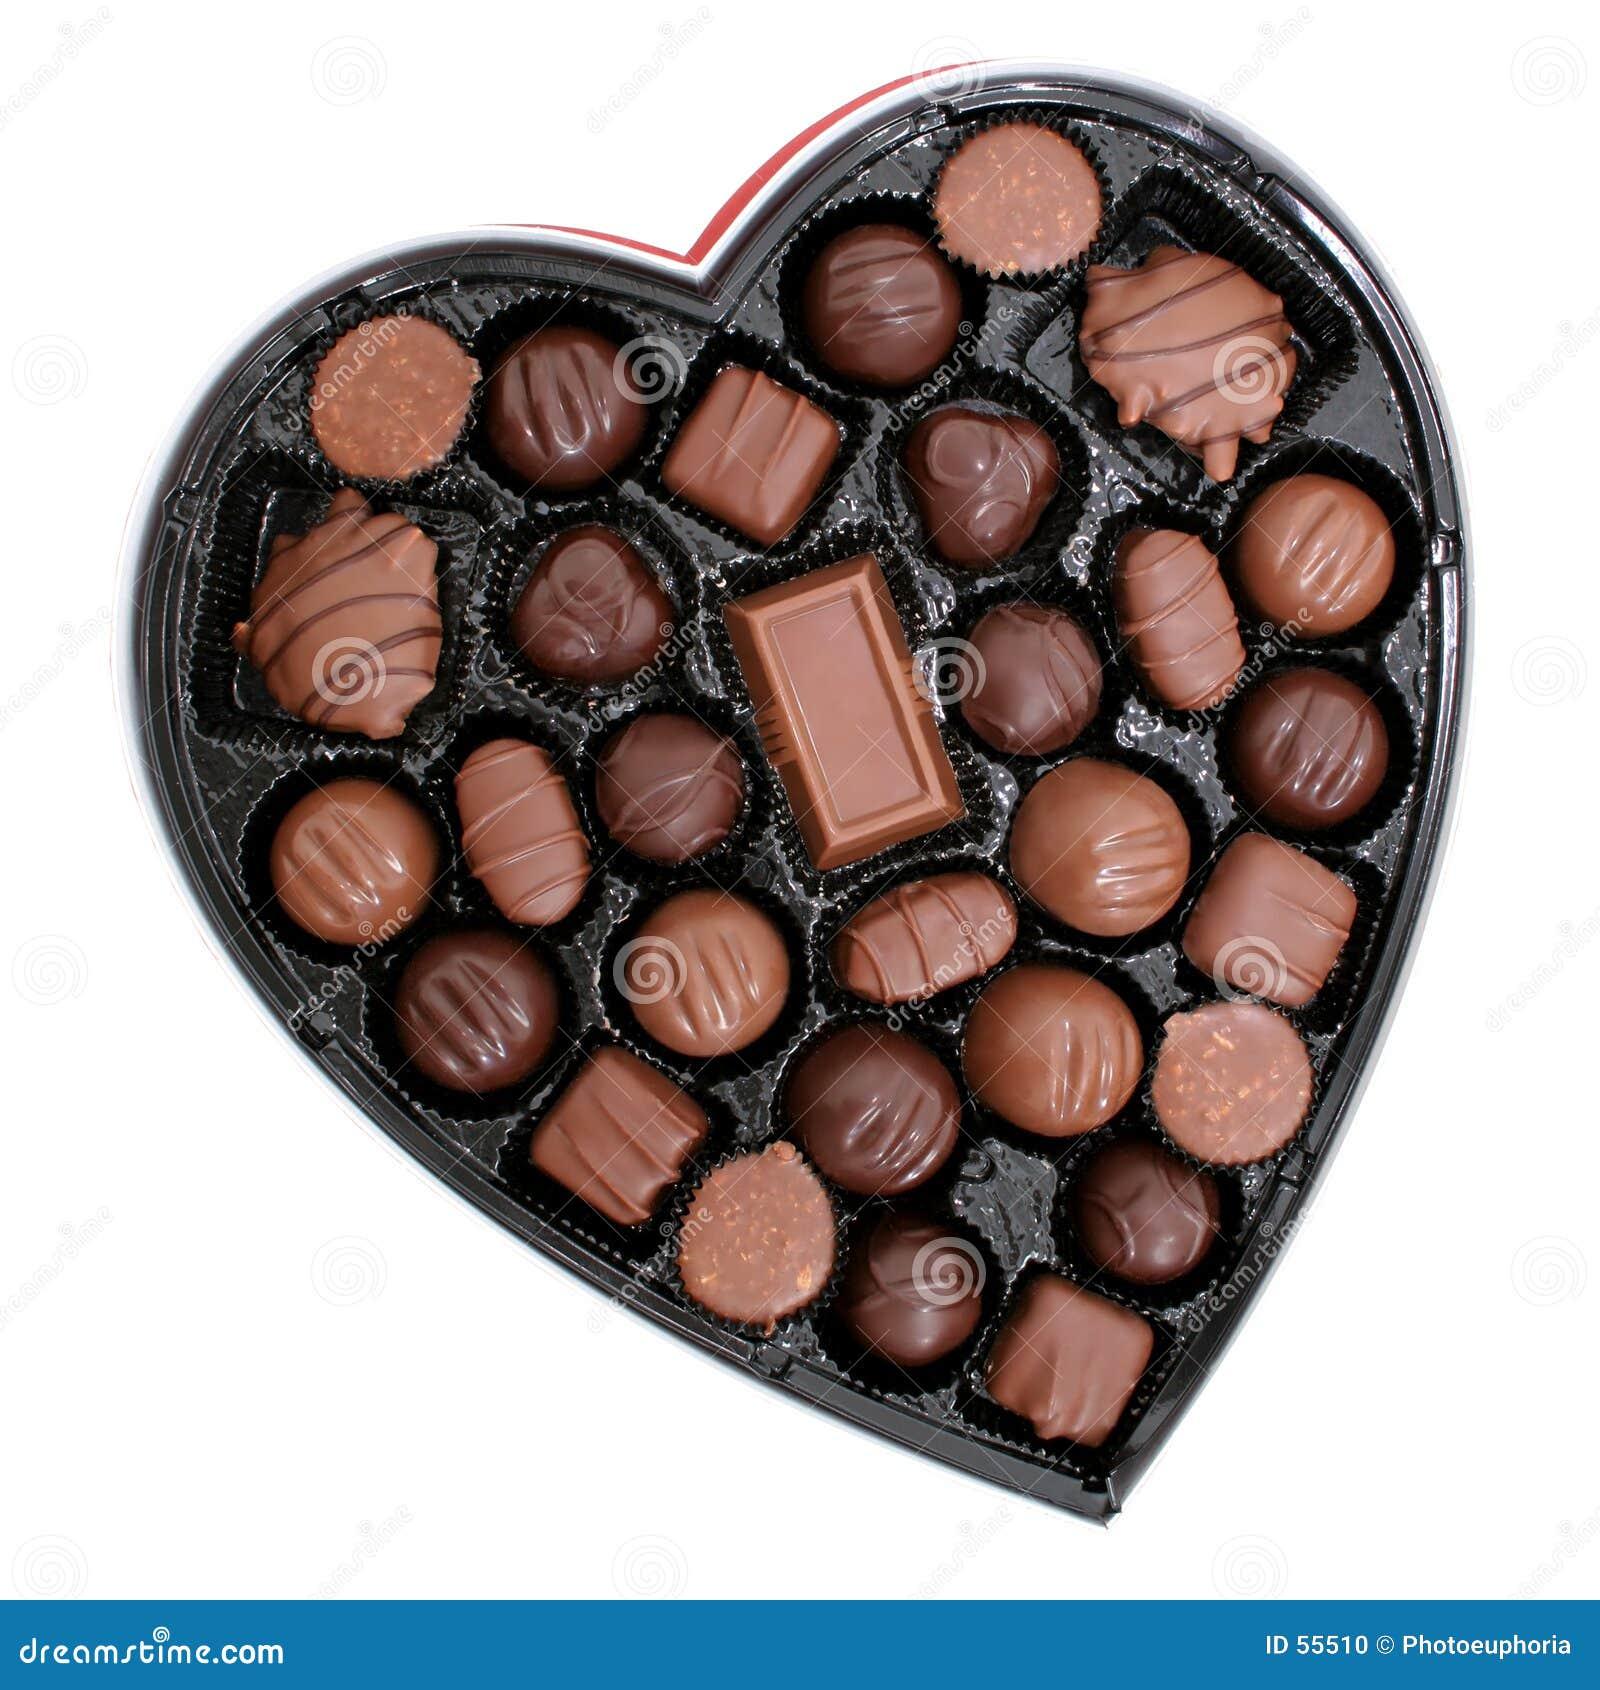 2mp 8 bombonierek pudełkowatych obrazu kształt serca